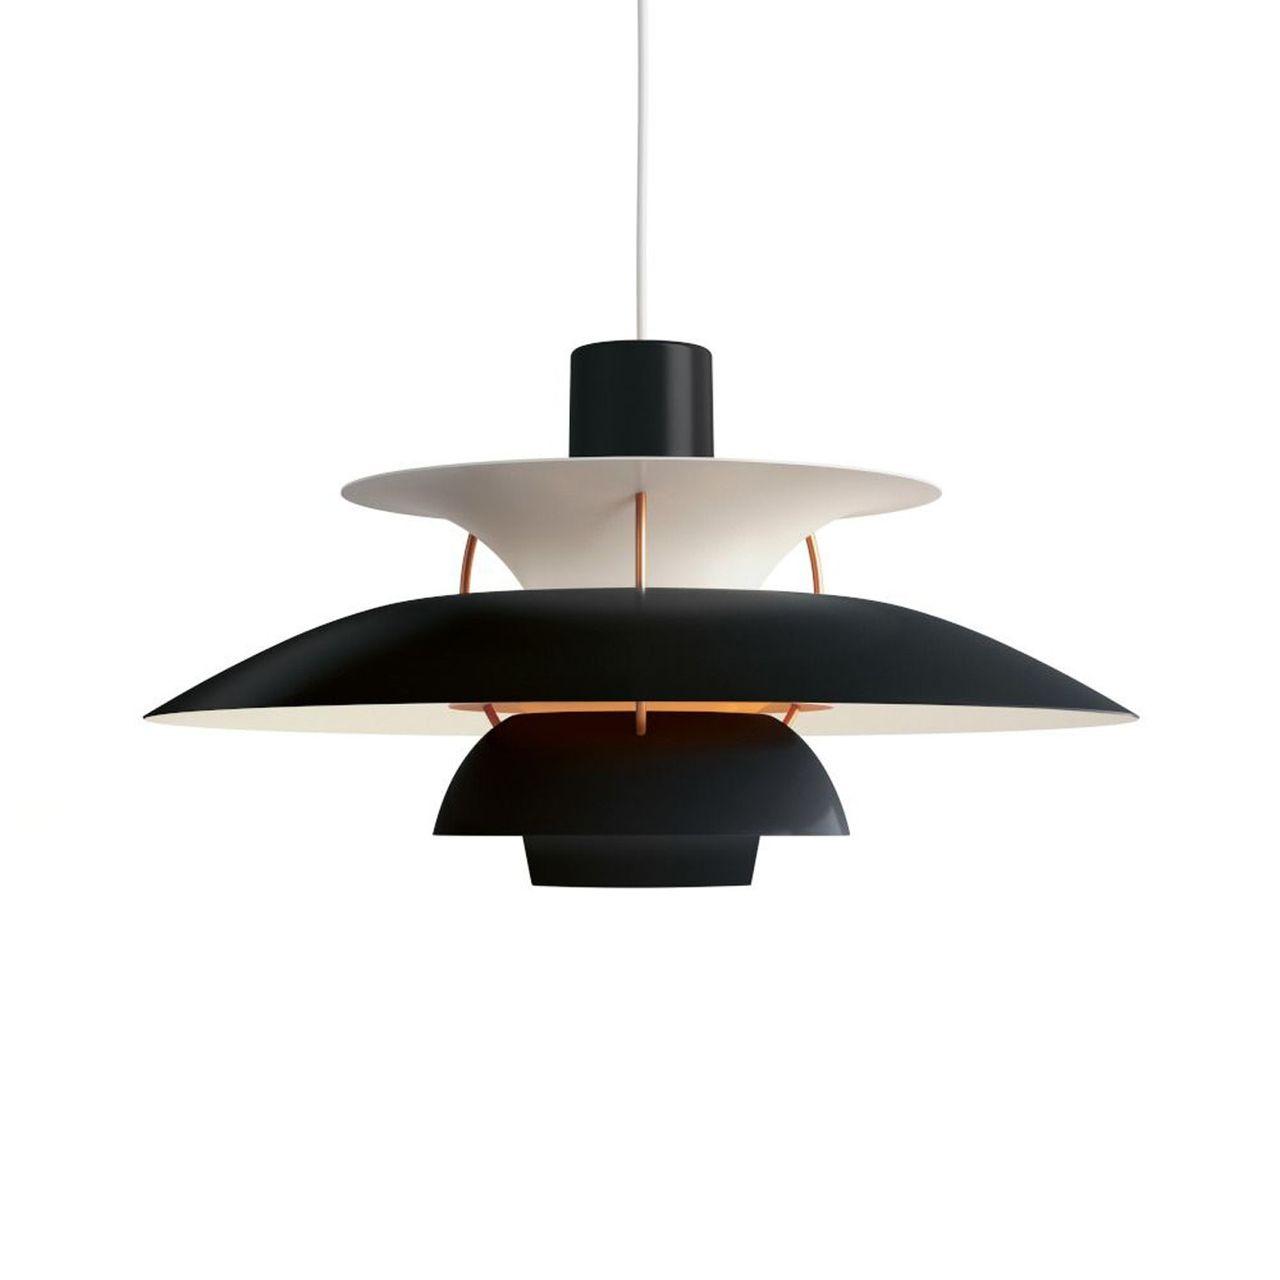 Louis Poulsen PH 5 Classic taklampe | Christiania Belysning